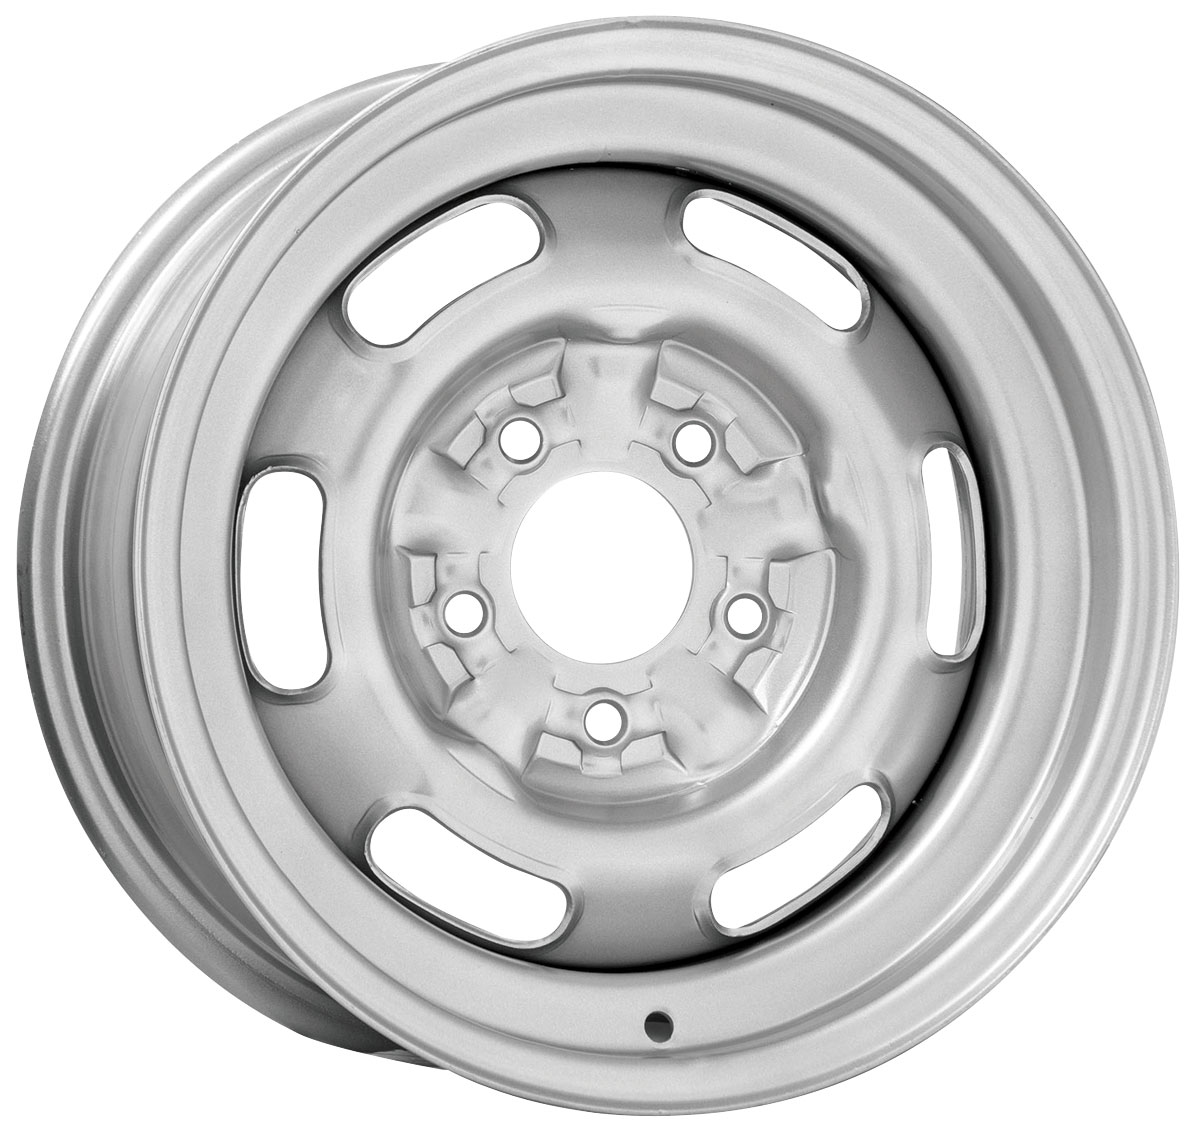 "Wheel, Pontiac Rally I, 14X6, 4"" Back Spacing"